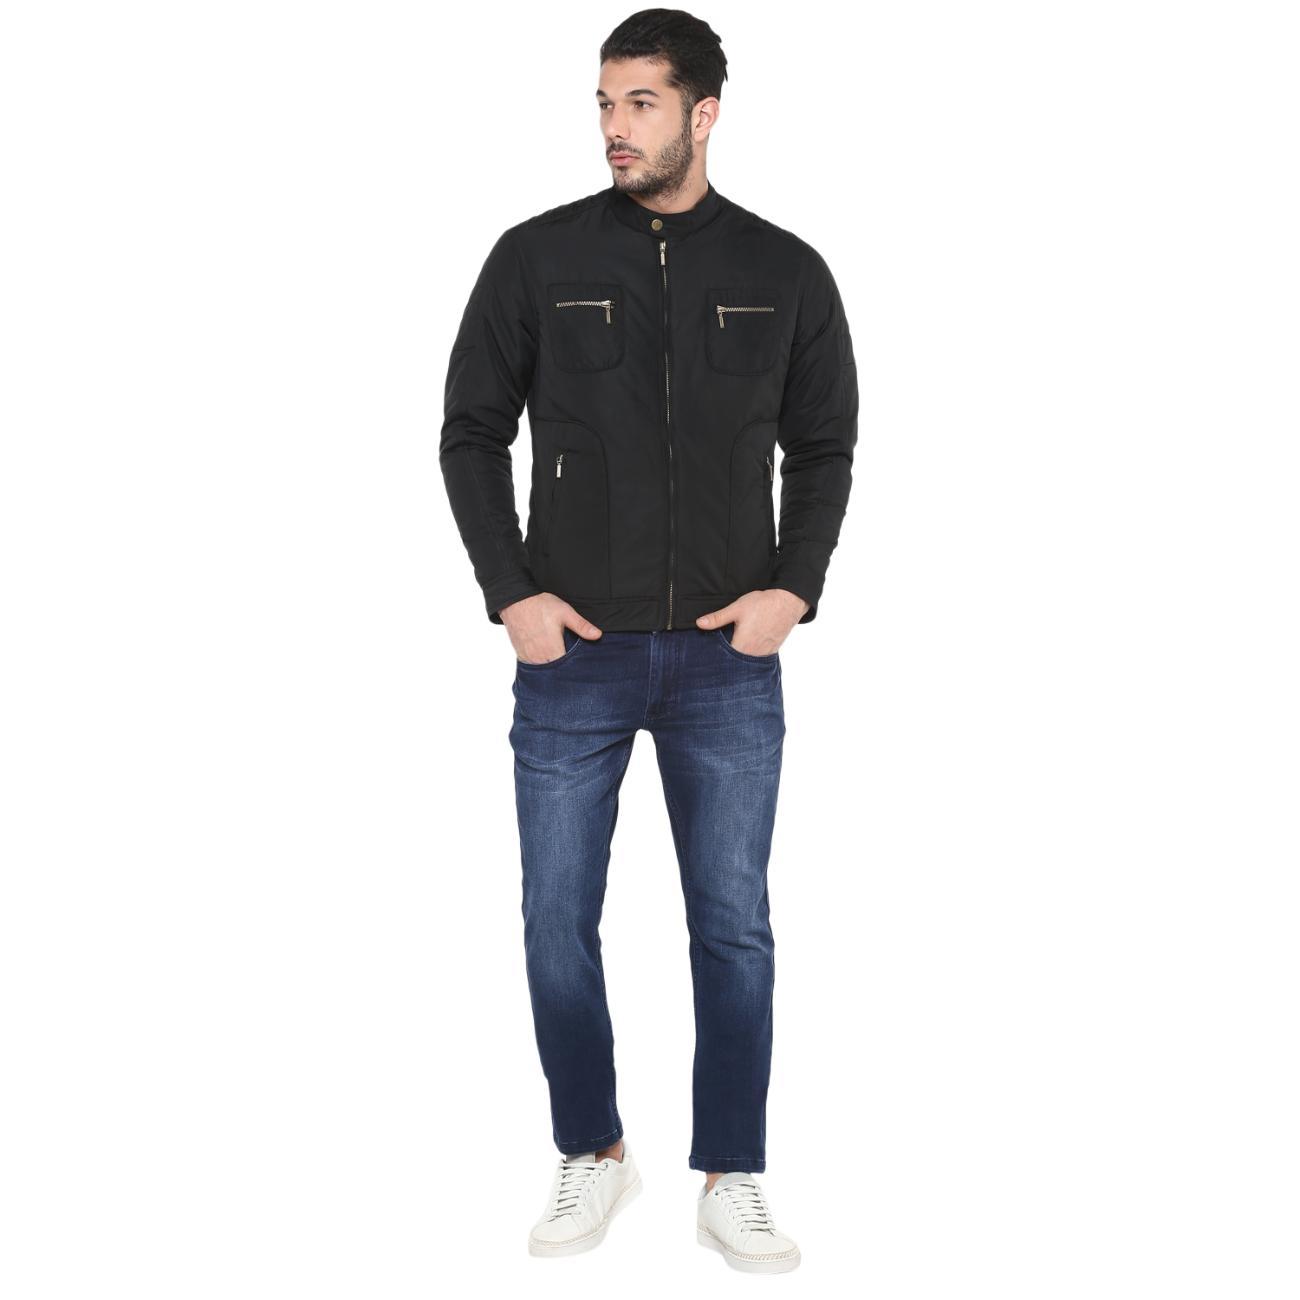 Men's Black Jacket Online